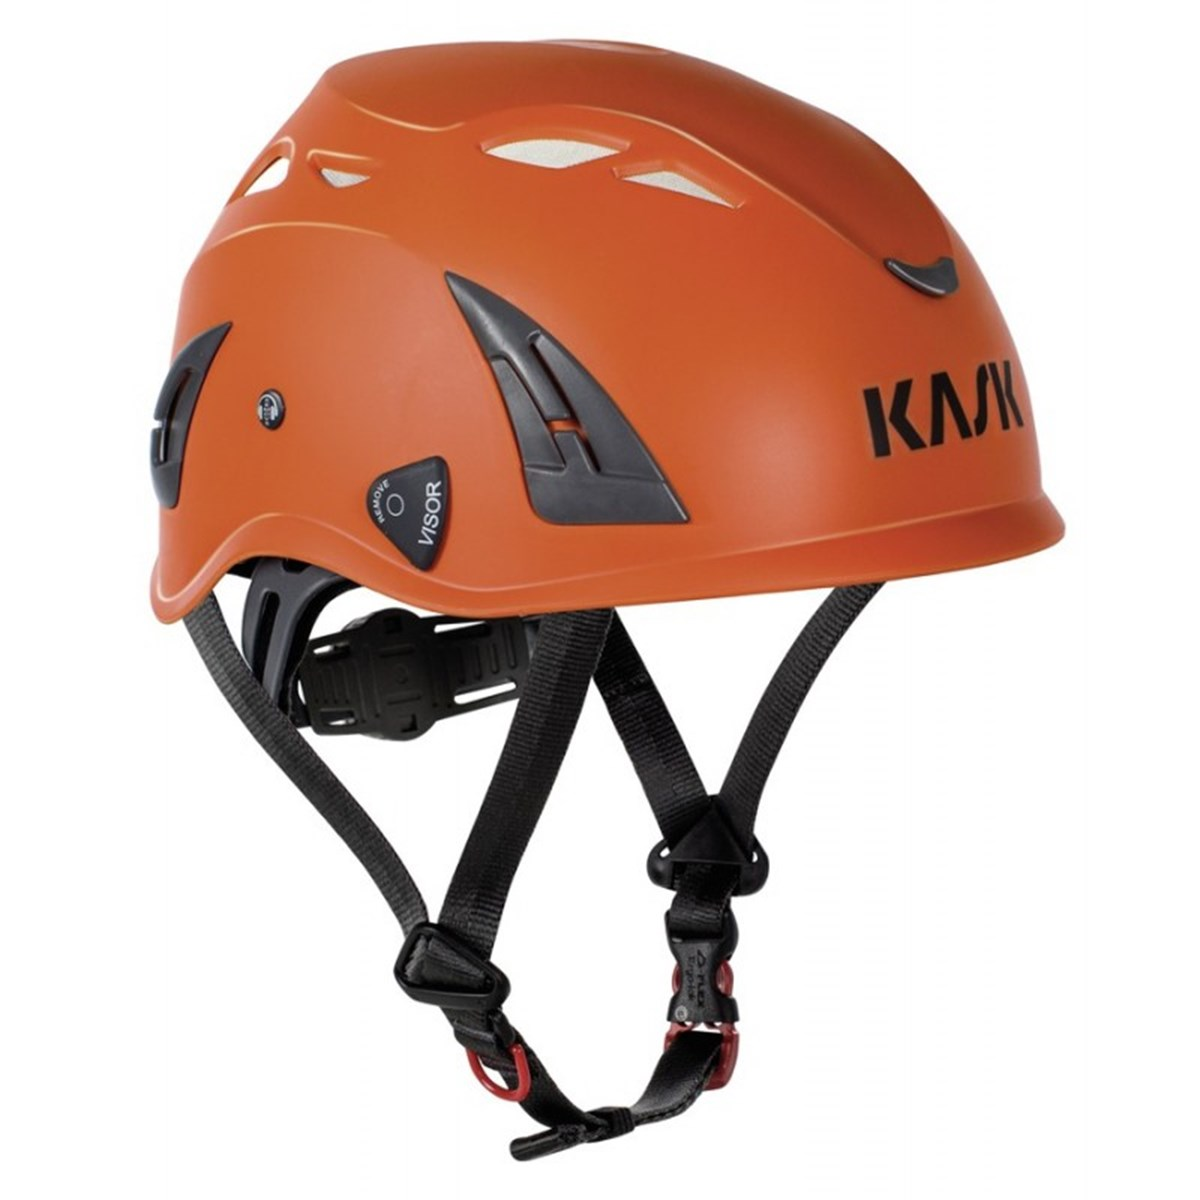 Kask helm plasma aq - oranje - en 397